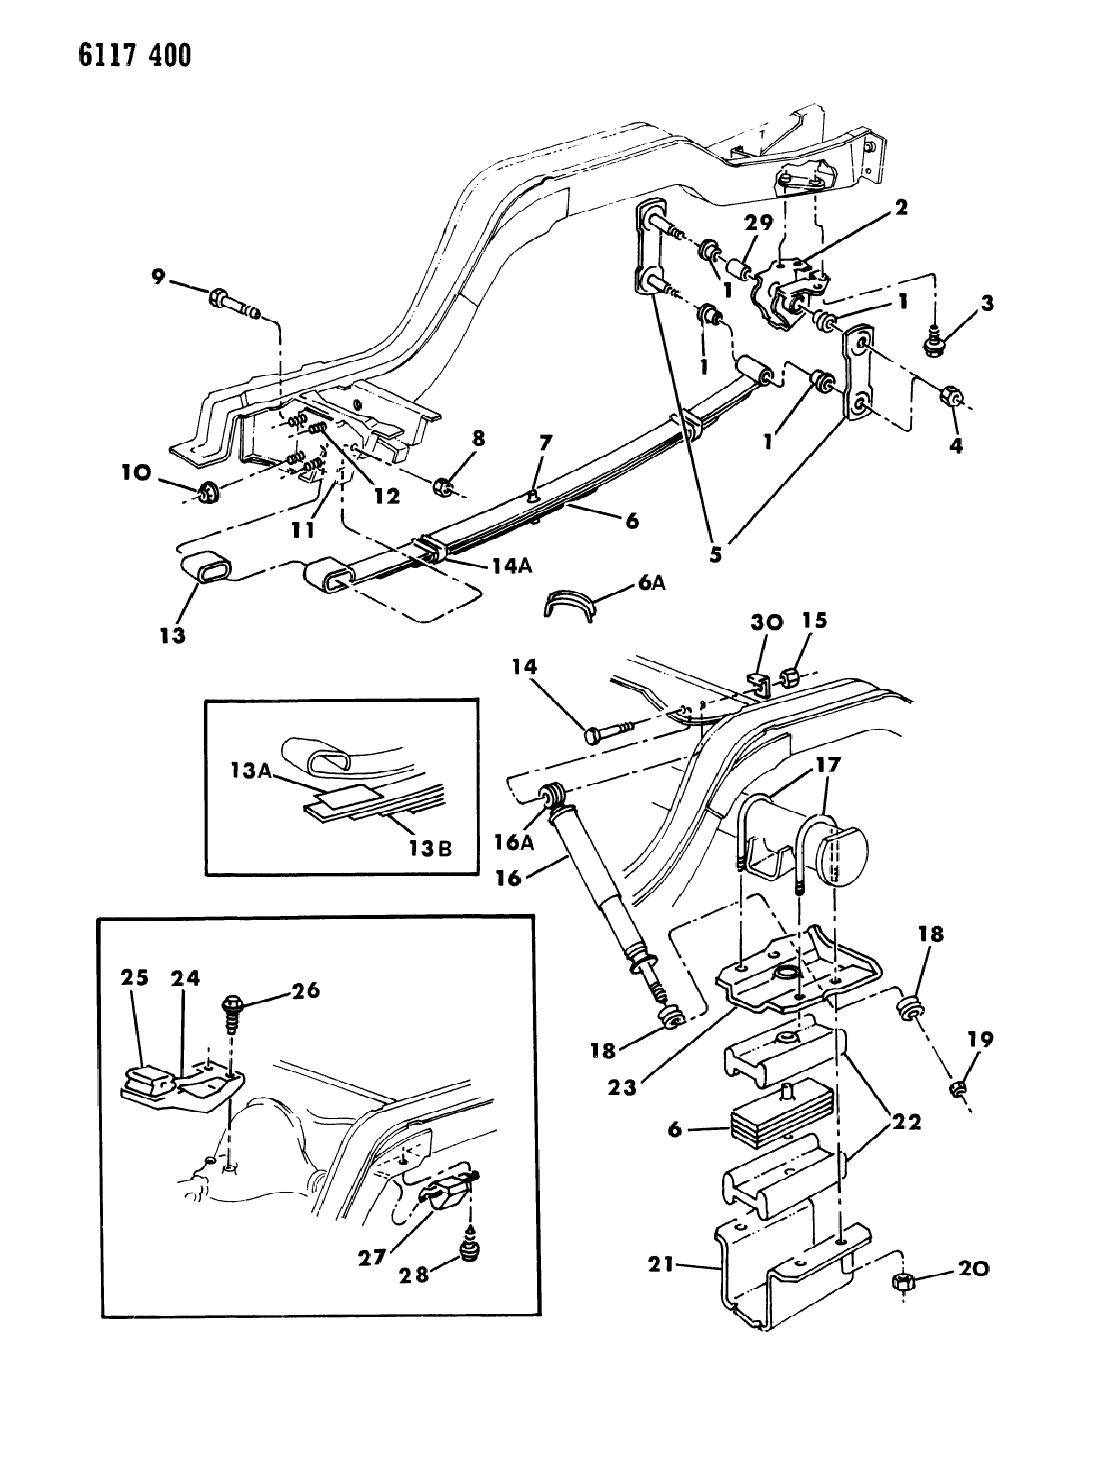 1986 Dodge Diplomat Suspension - Rear